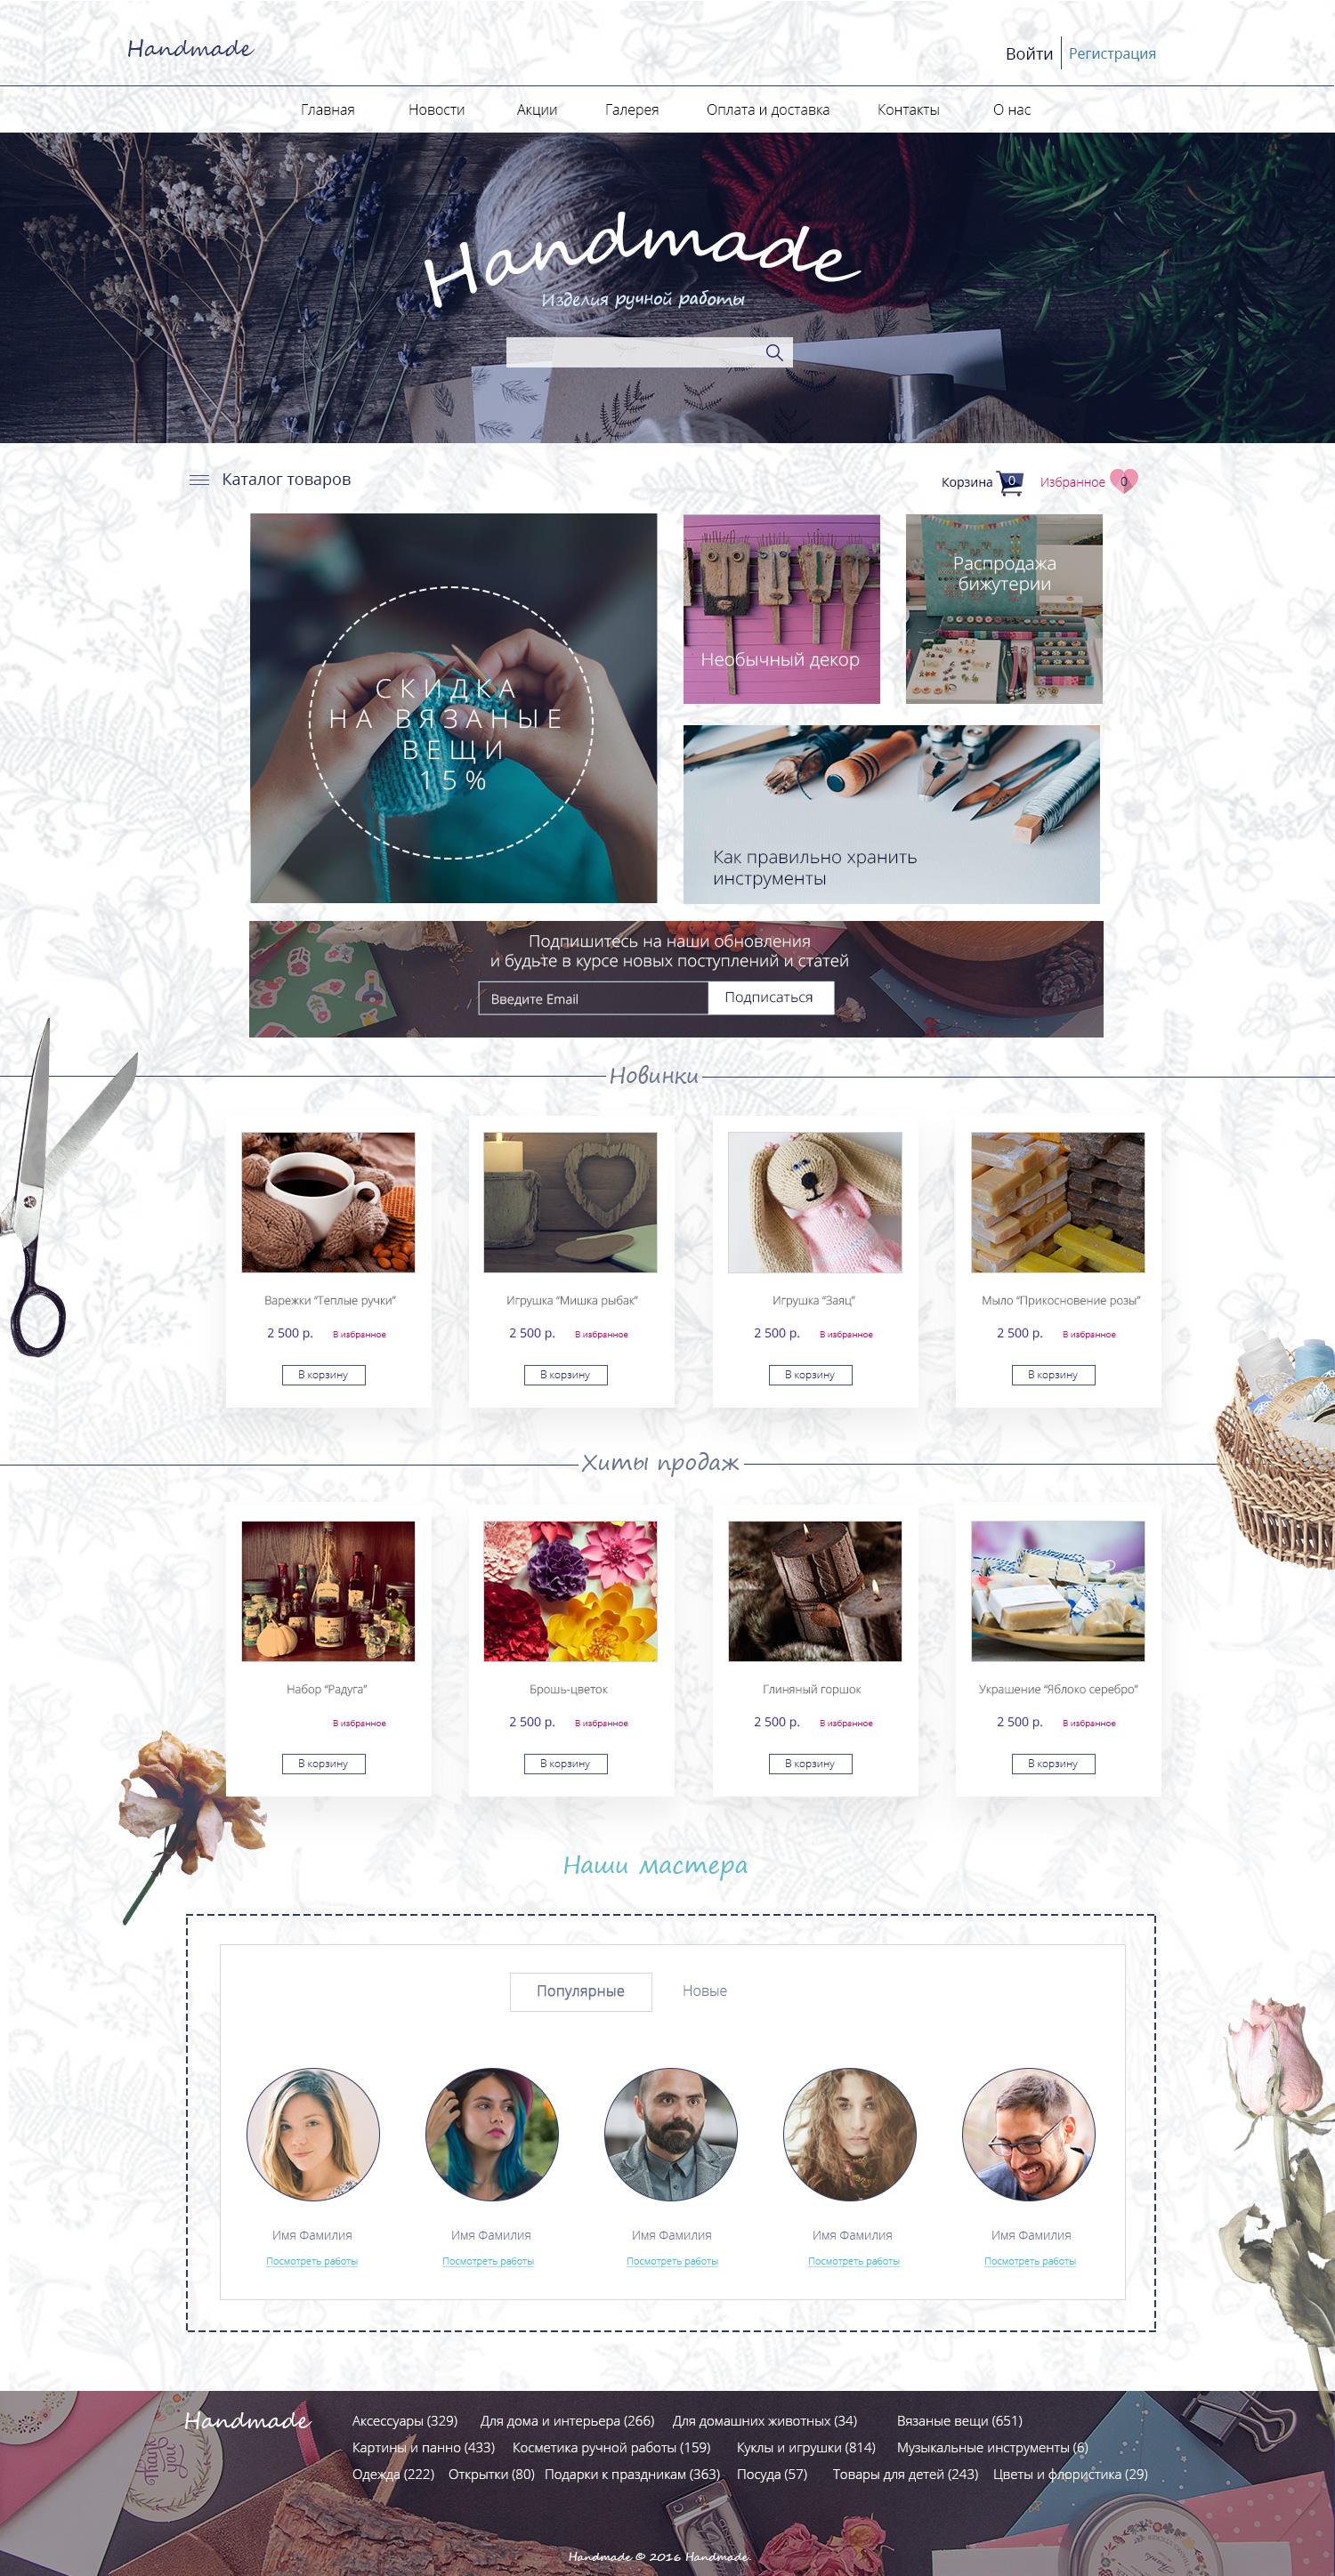 Разработка дизайна портала по тематике handmade. фото f_498587515ce9db7a.jpg